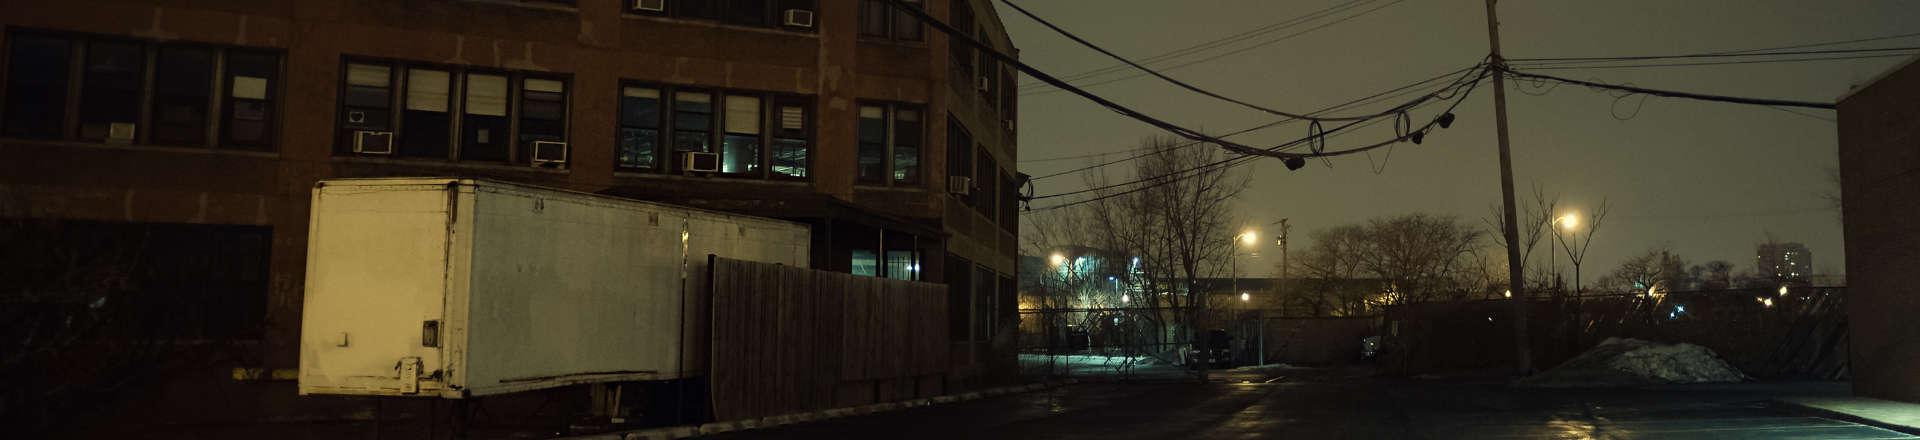 darken city area with inadequate lighting